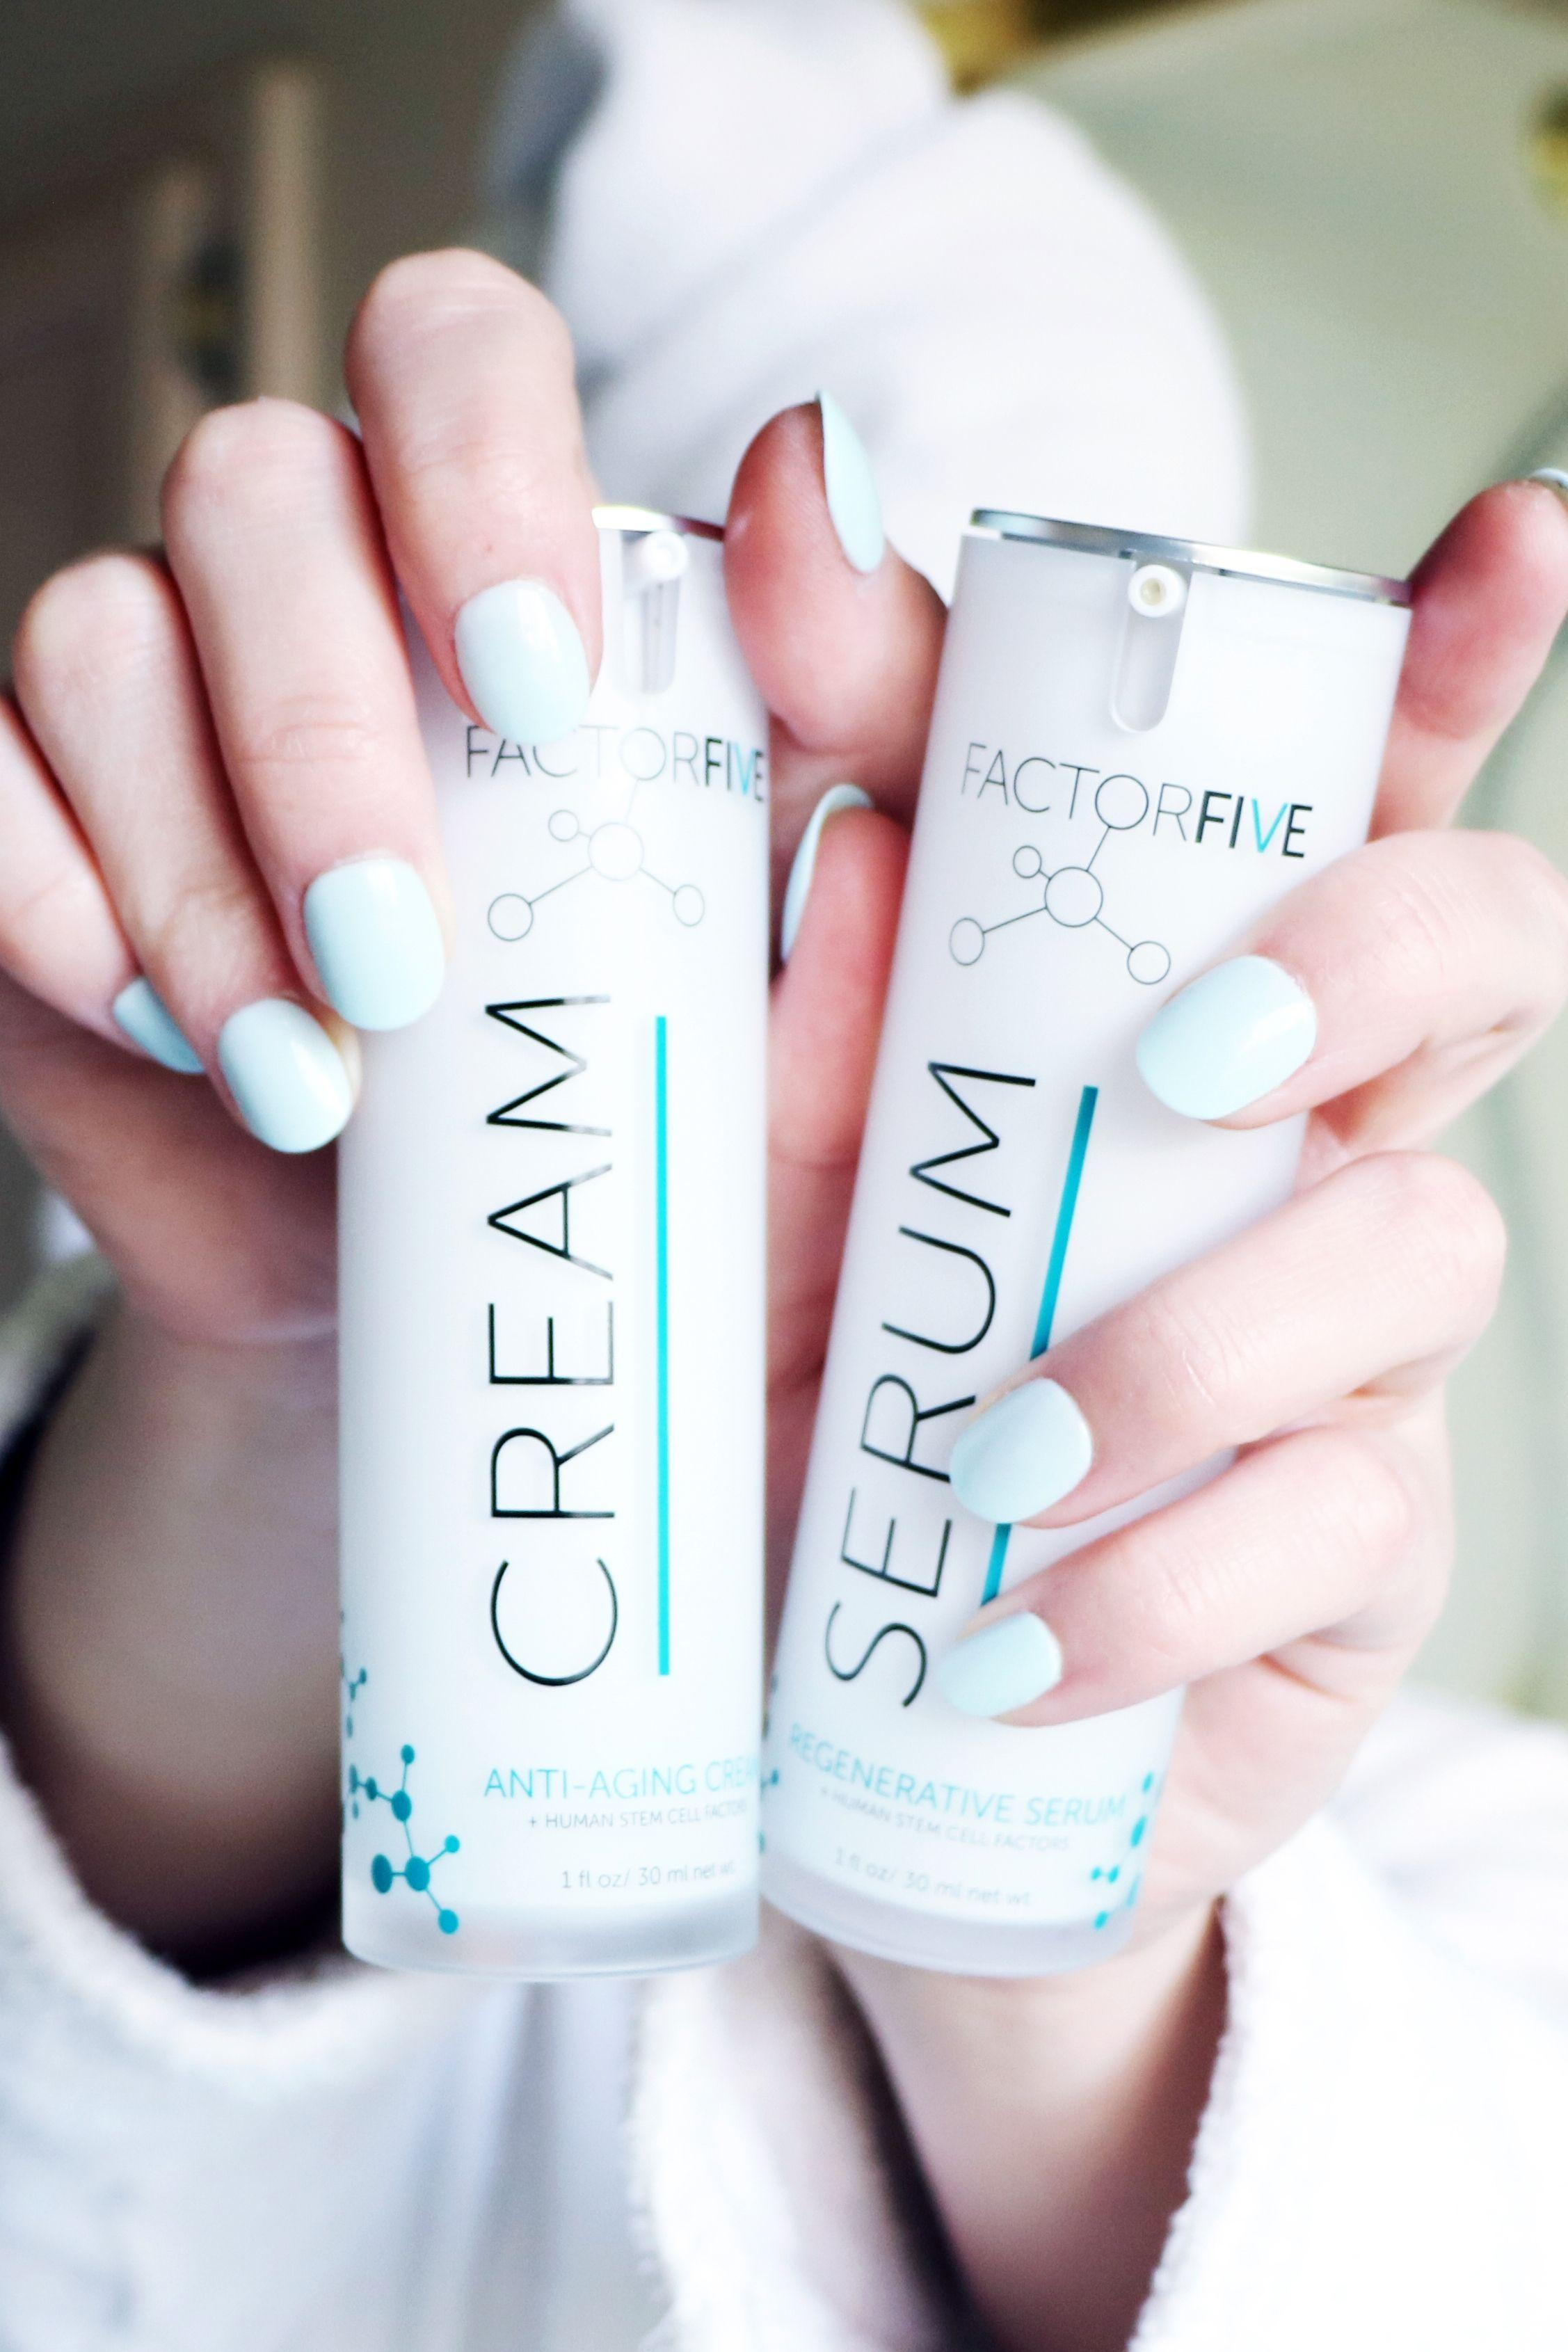 The Ultimate Anti Aging Skincare Duo In 2020 Skin Care Aging Skin Care Anti Aging Cream